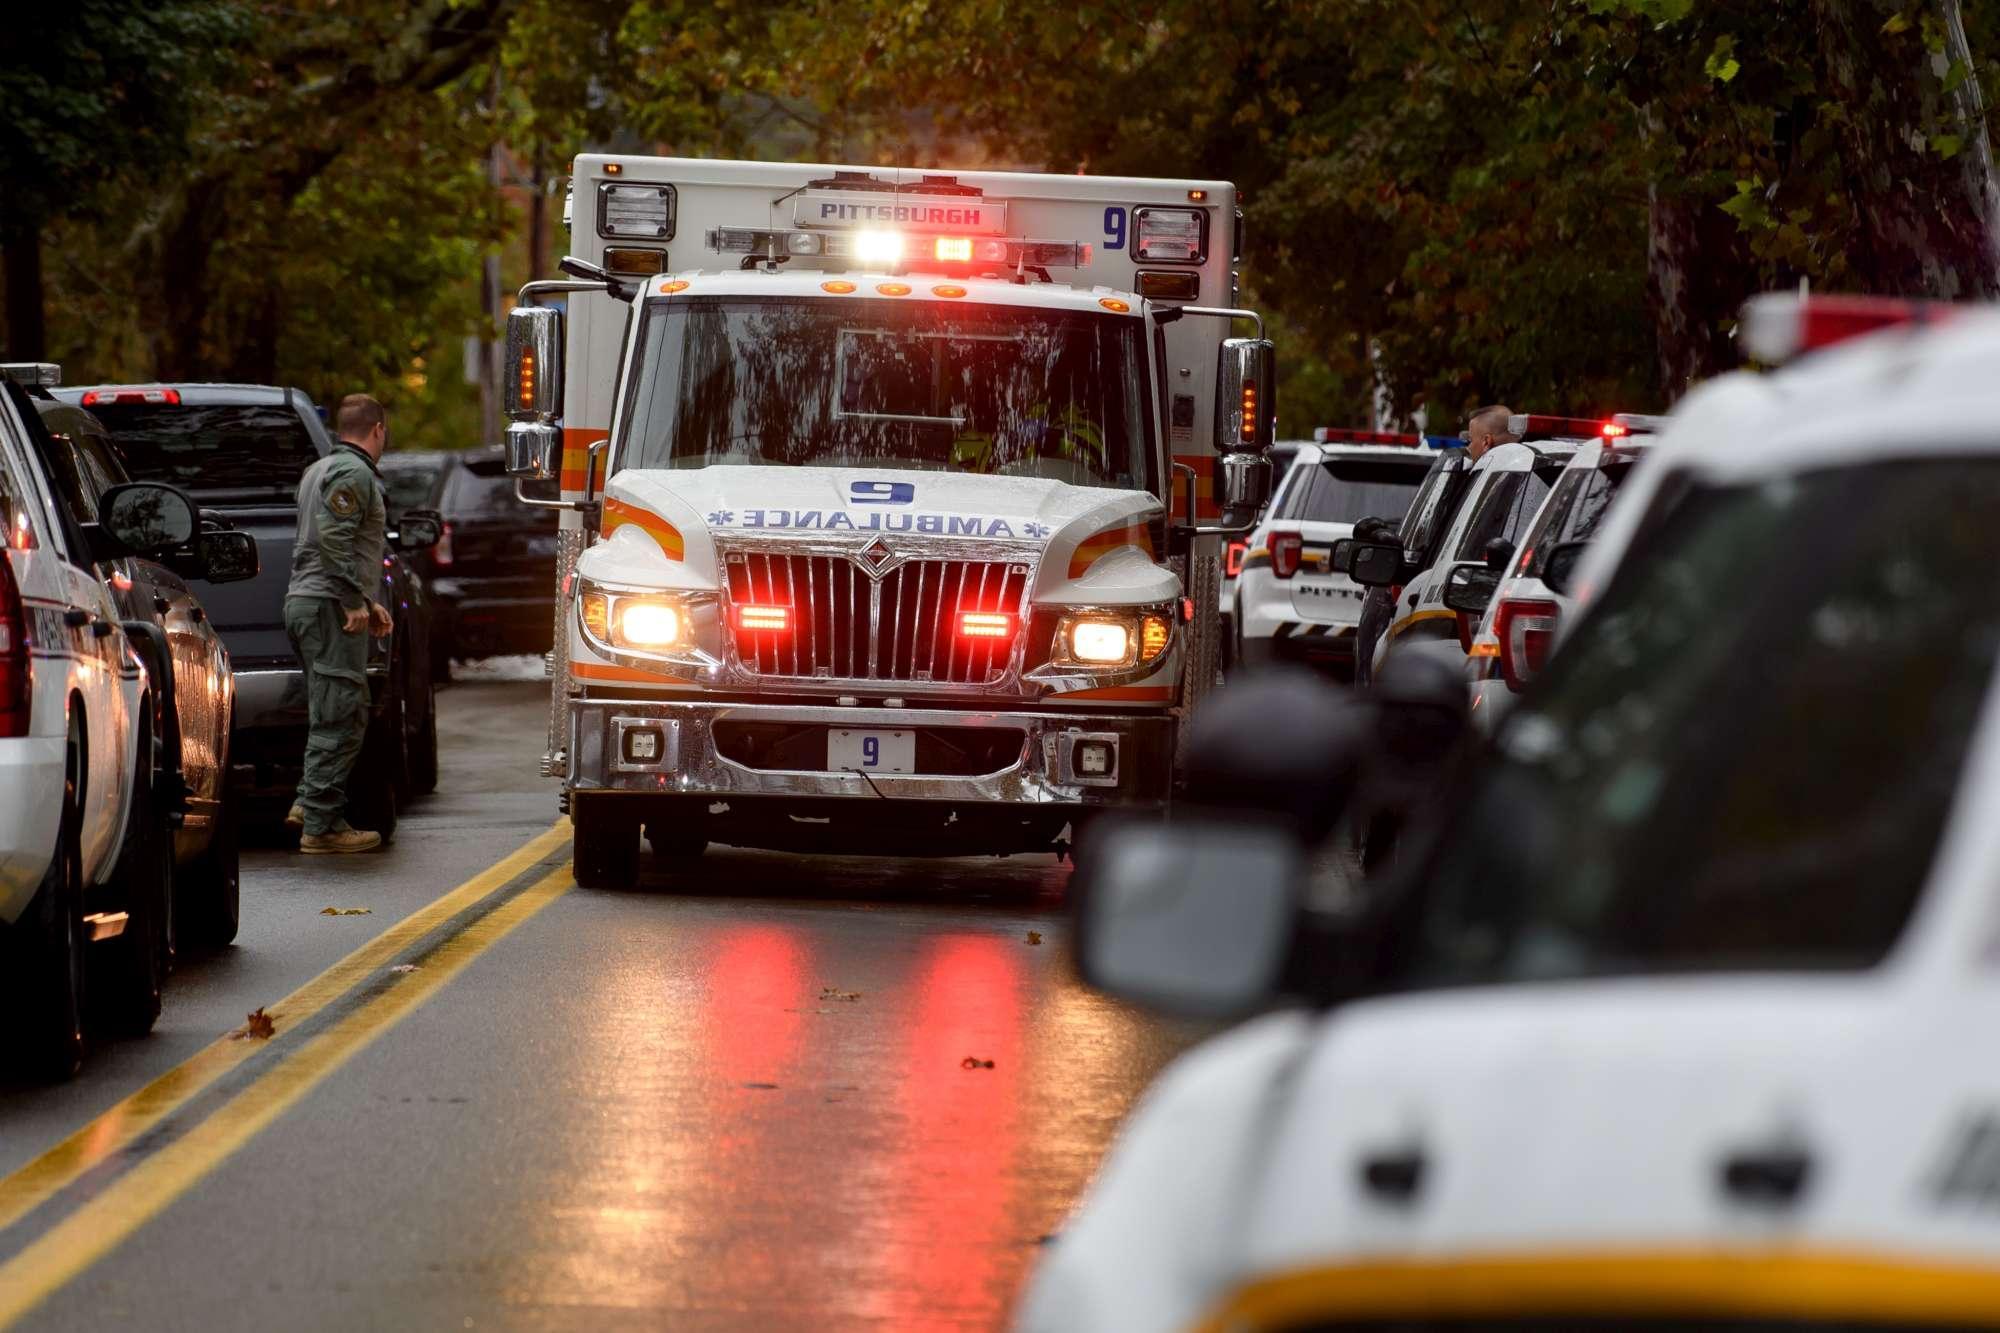 Usa, spari in una sinagoga a Pittsburgh: vittime